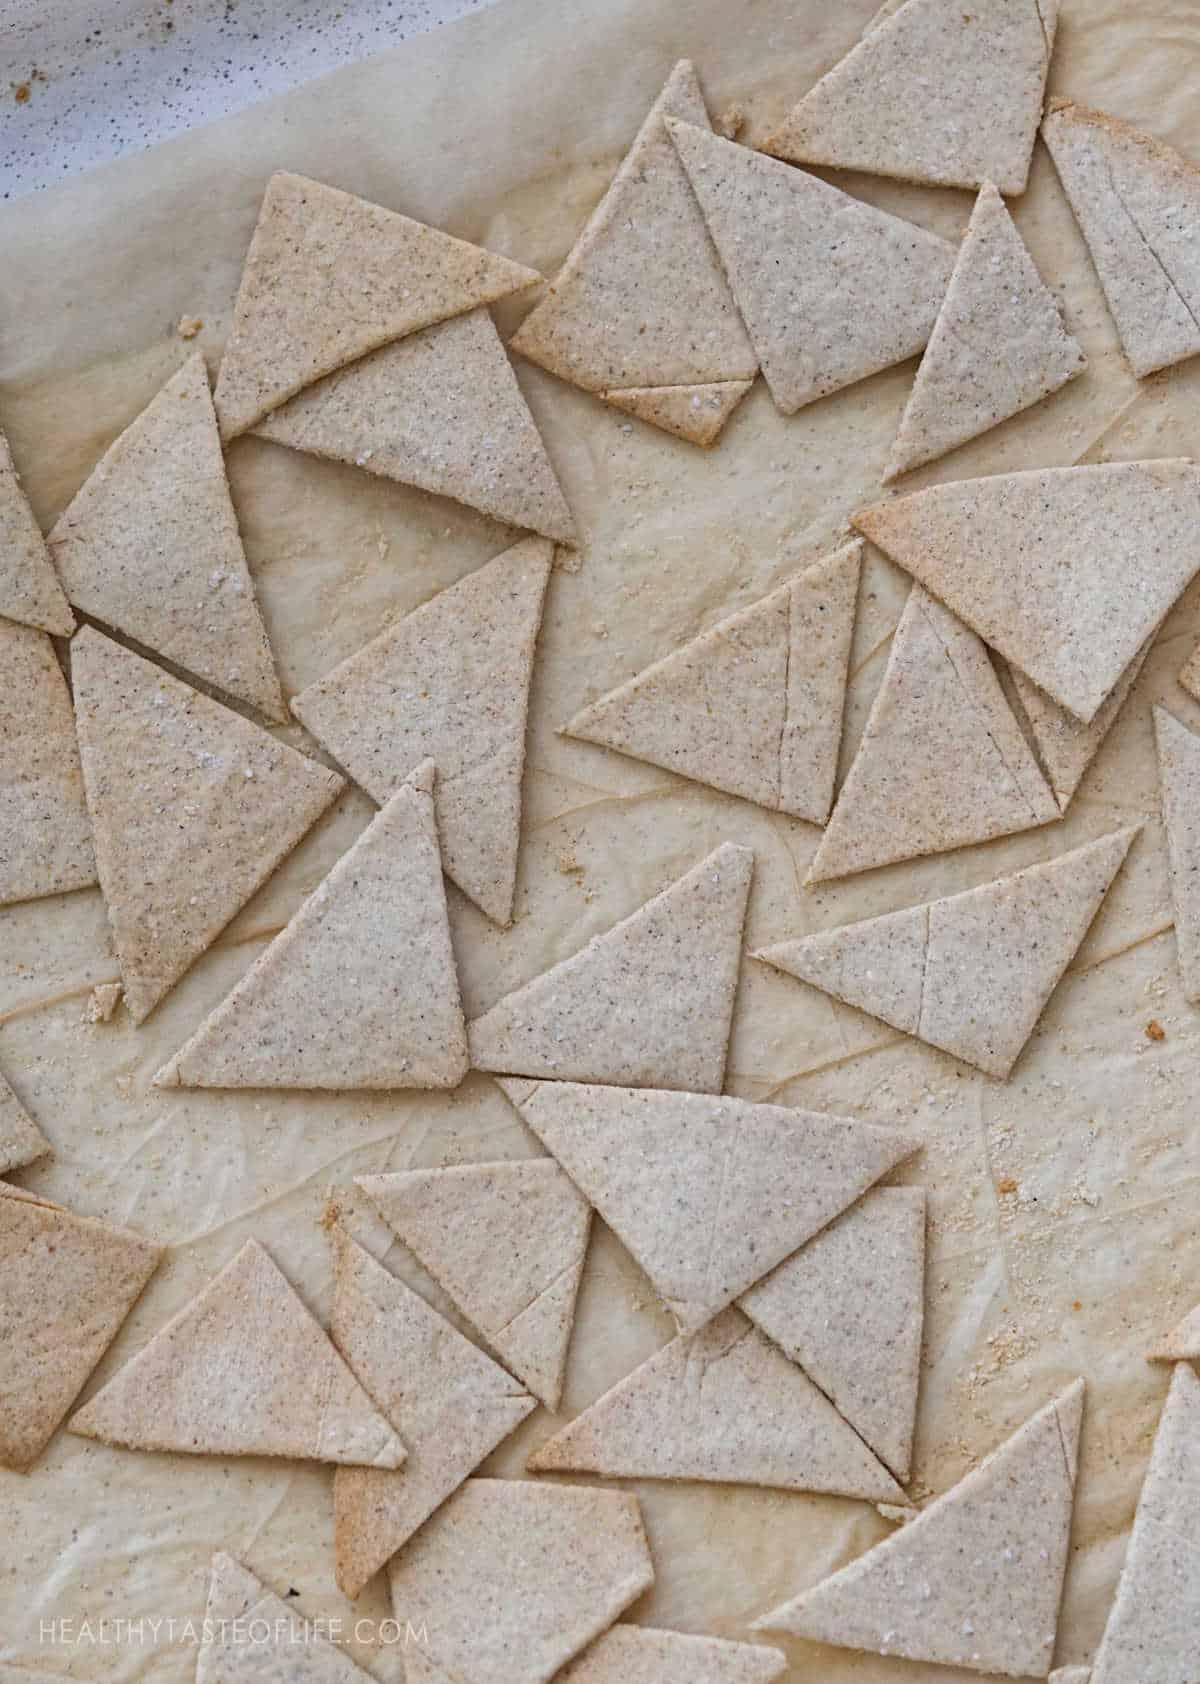 Grain free cassava crackers on a cookie sheet.